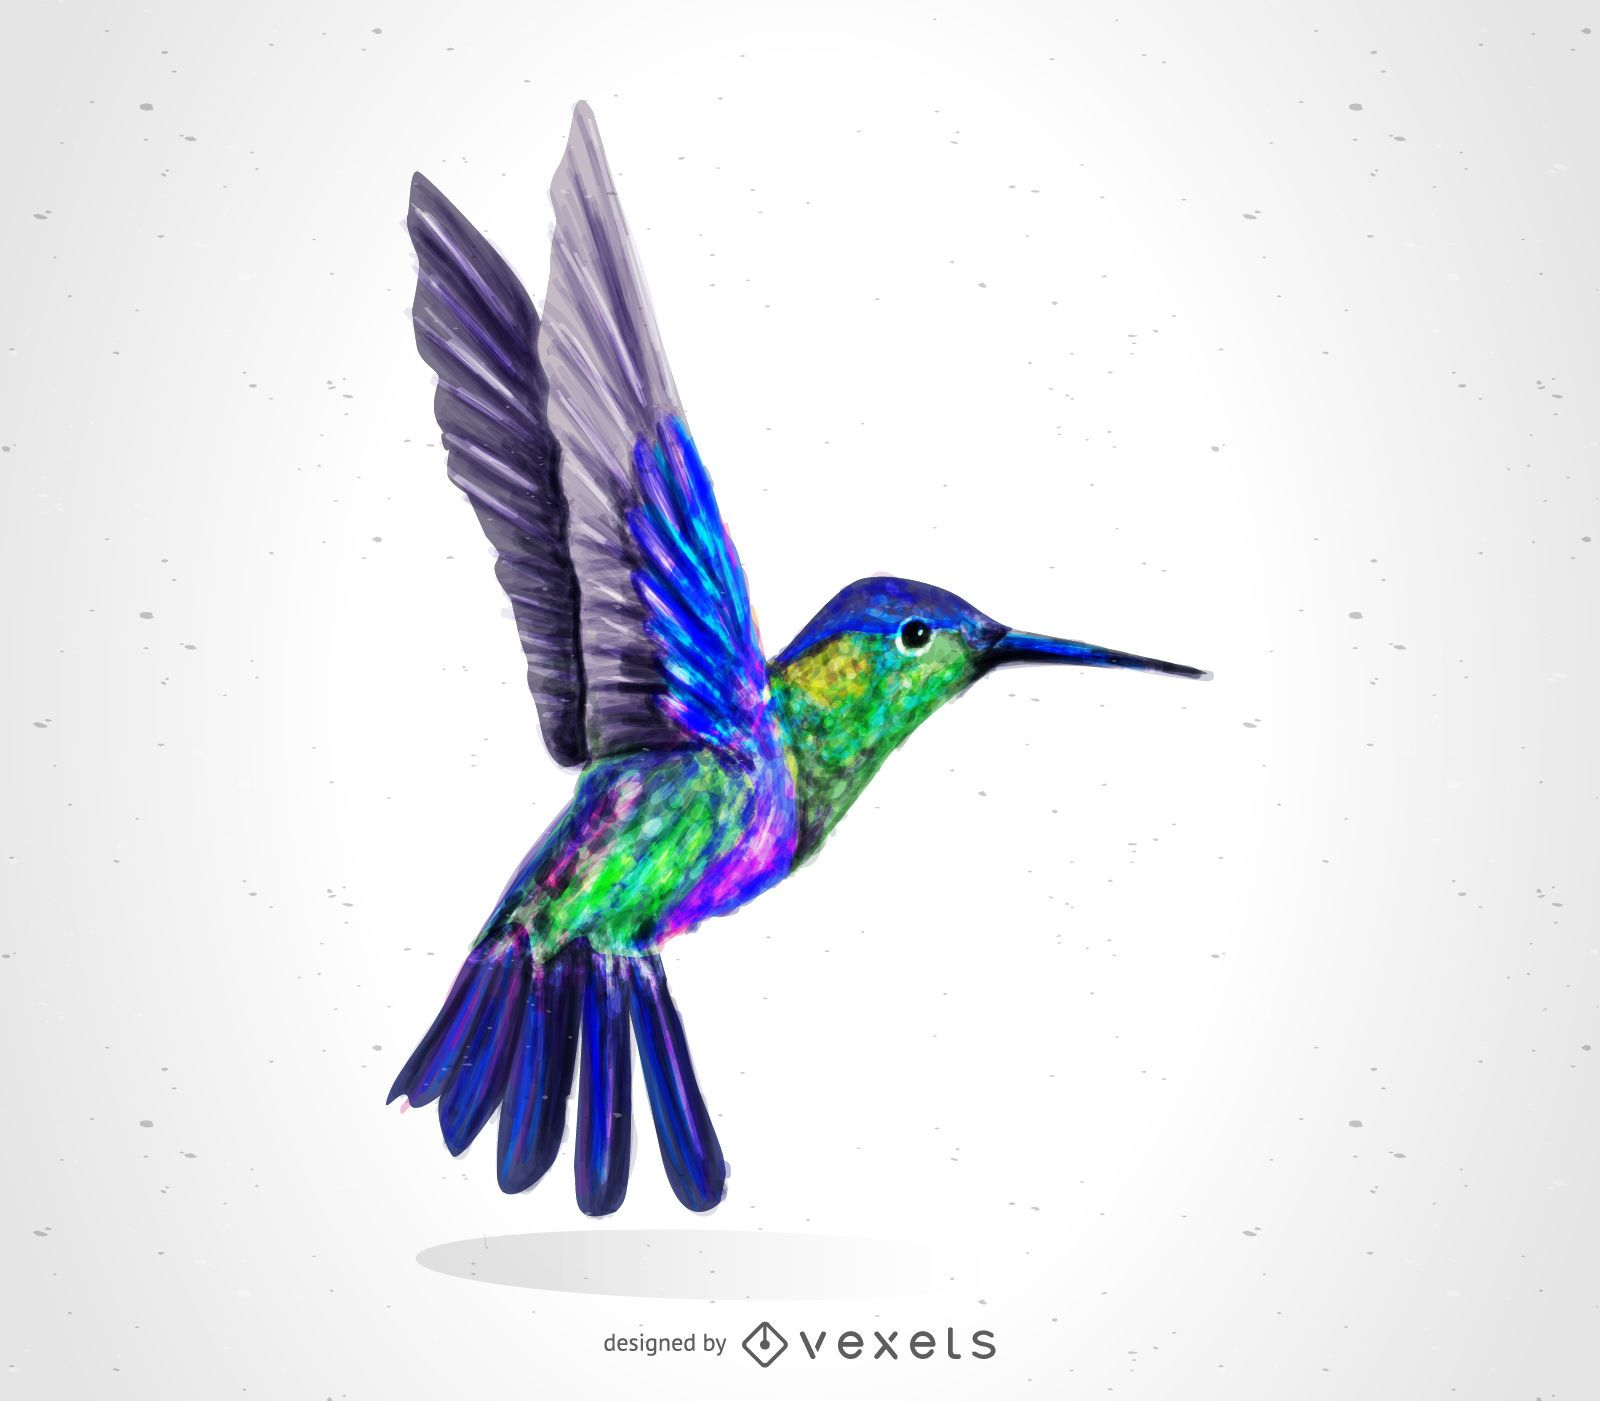 Hummingbird bird drawing